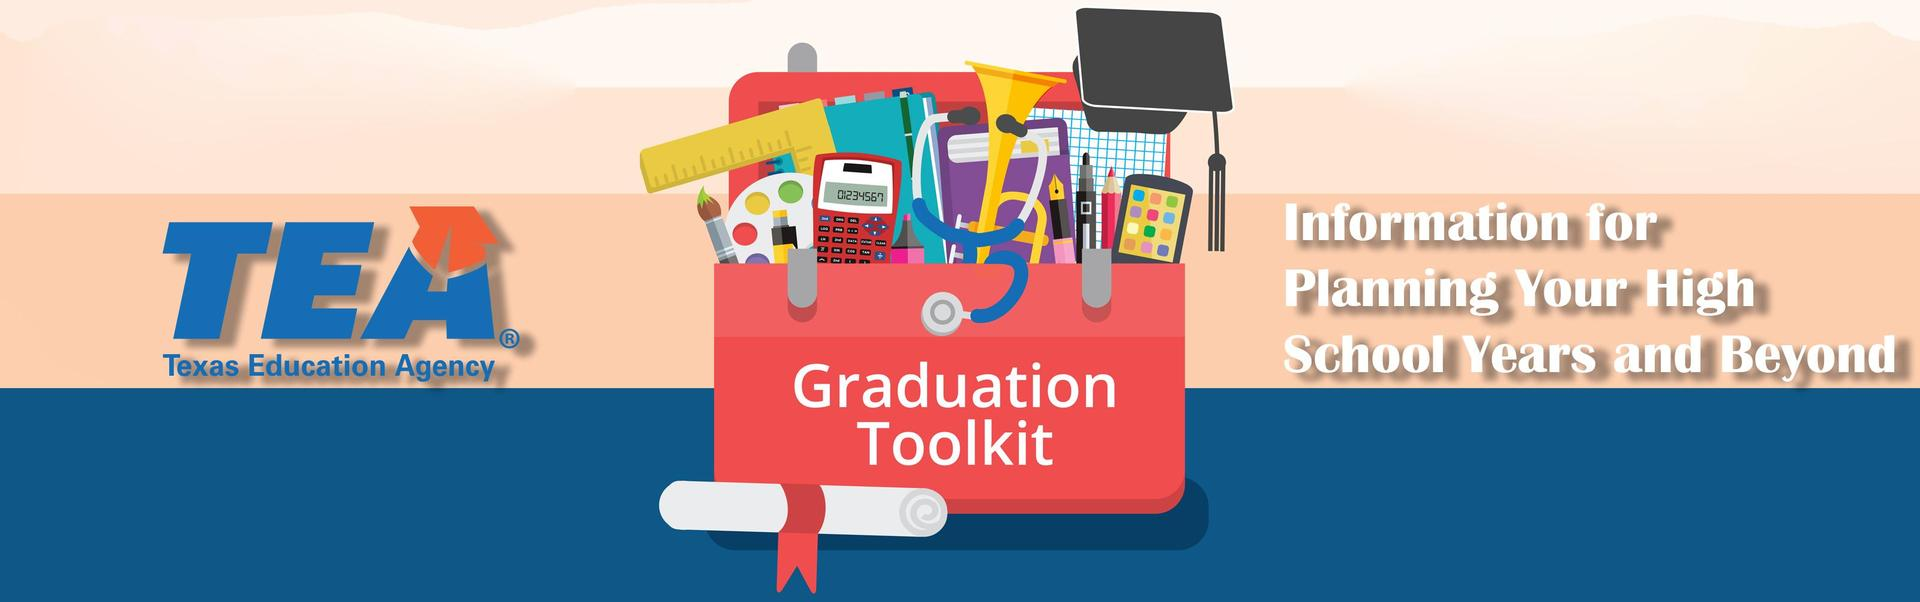 Graduation tool kit banner